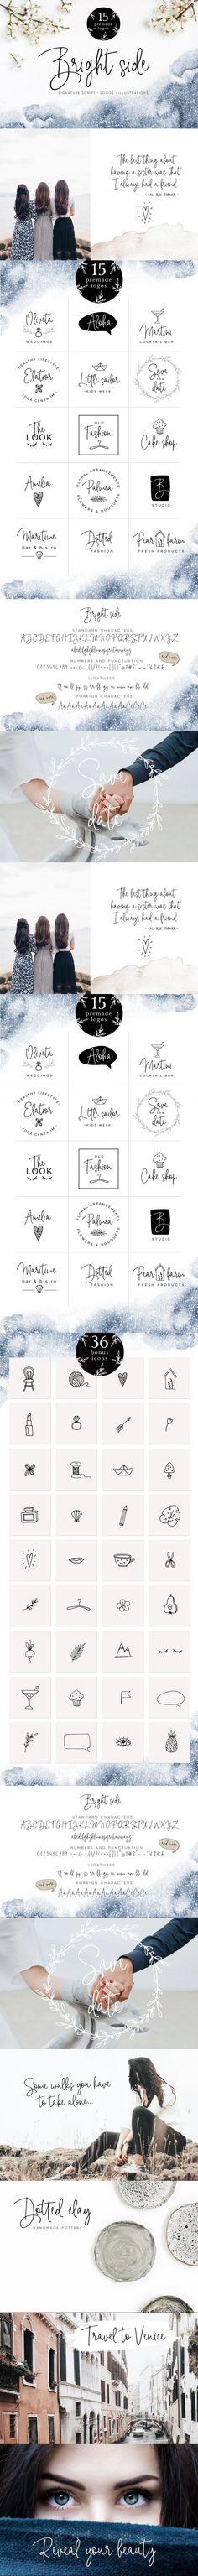 Bright Side script font & logos #typeface #food #vectorlogo #branding #editablelogos #typography #spring #german #country #handdrawnlogos #whimsicallogo #greetingcard #tea #ttf #sketch #template #opentype #fontbundle #casual Wedding Fonts, Wedding Invitations, Script Fonts, How To Draw Hands, Food Template, Font Alphabet, Open Type, Bright, Tea